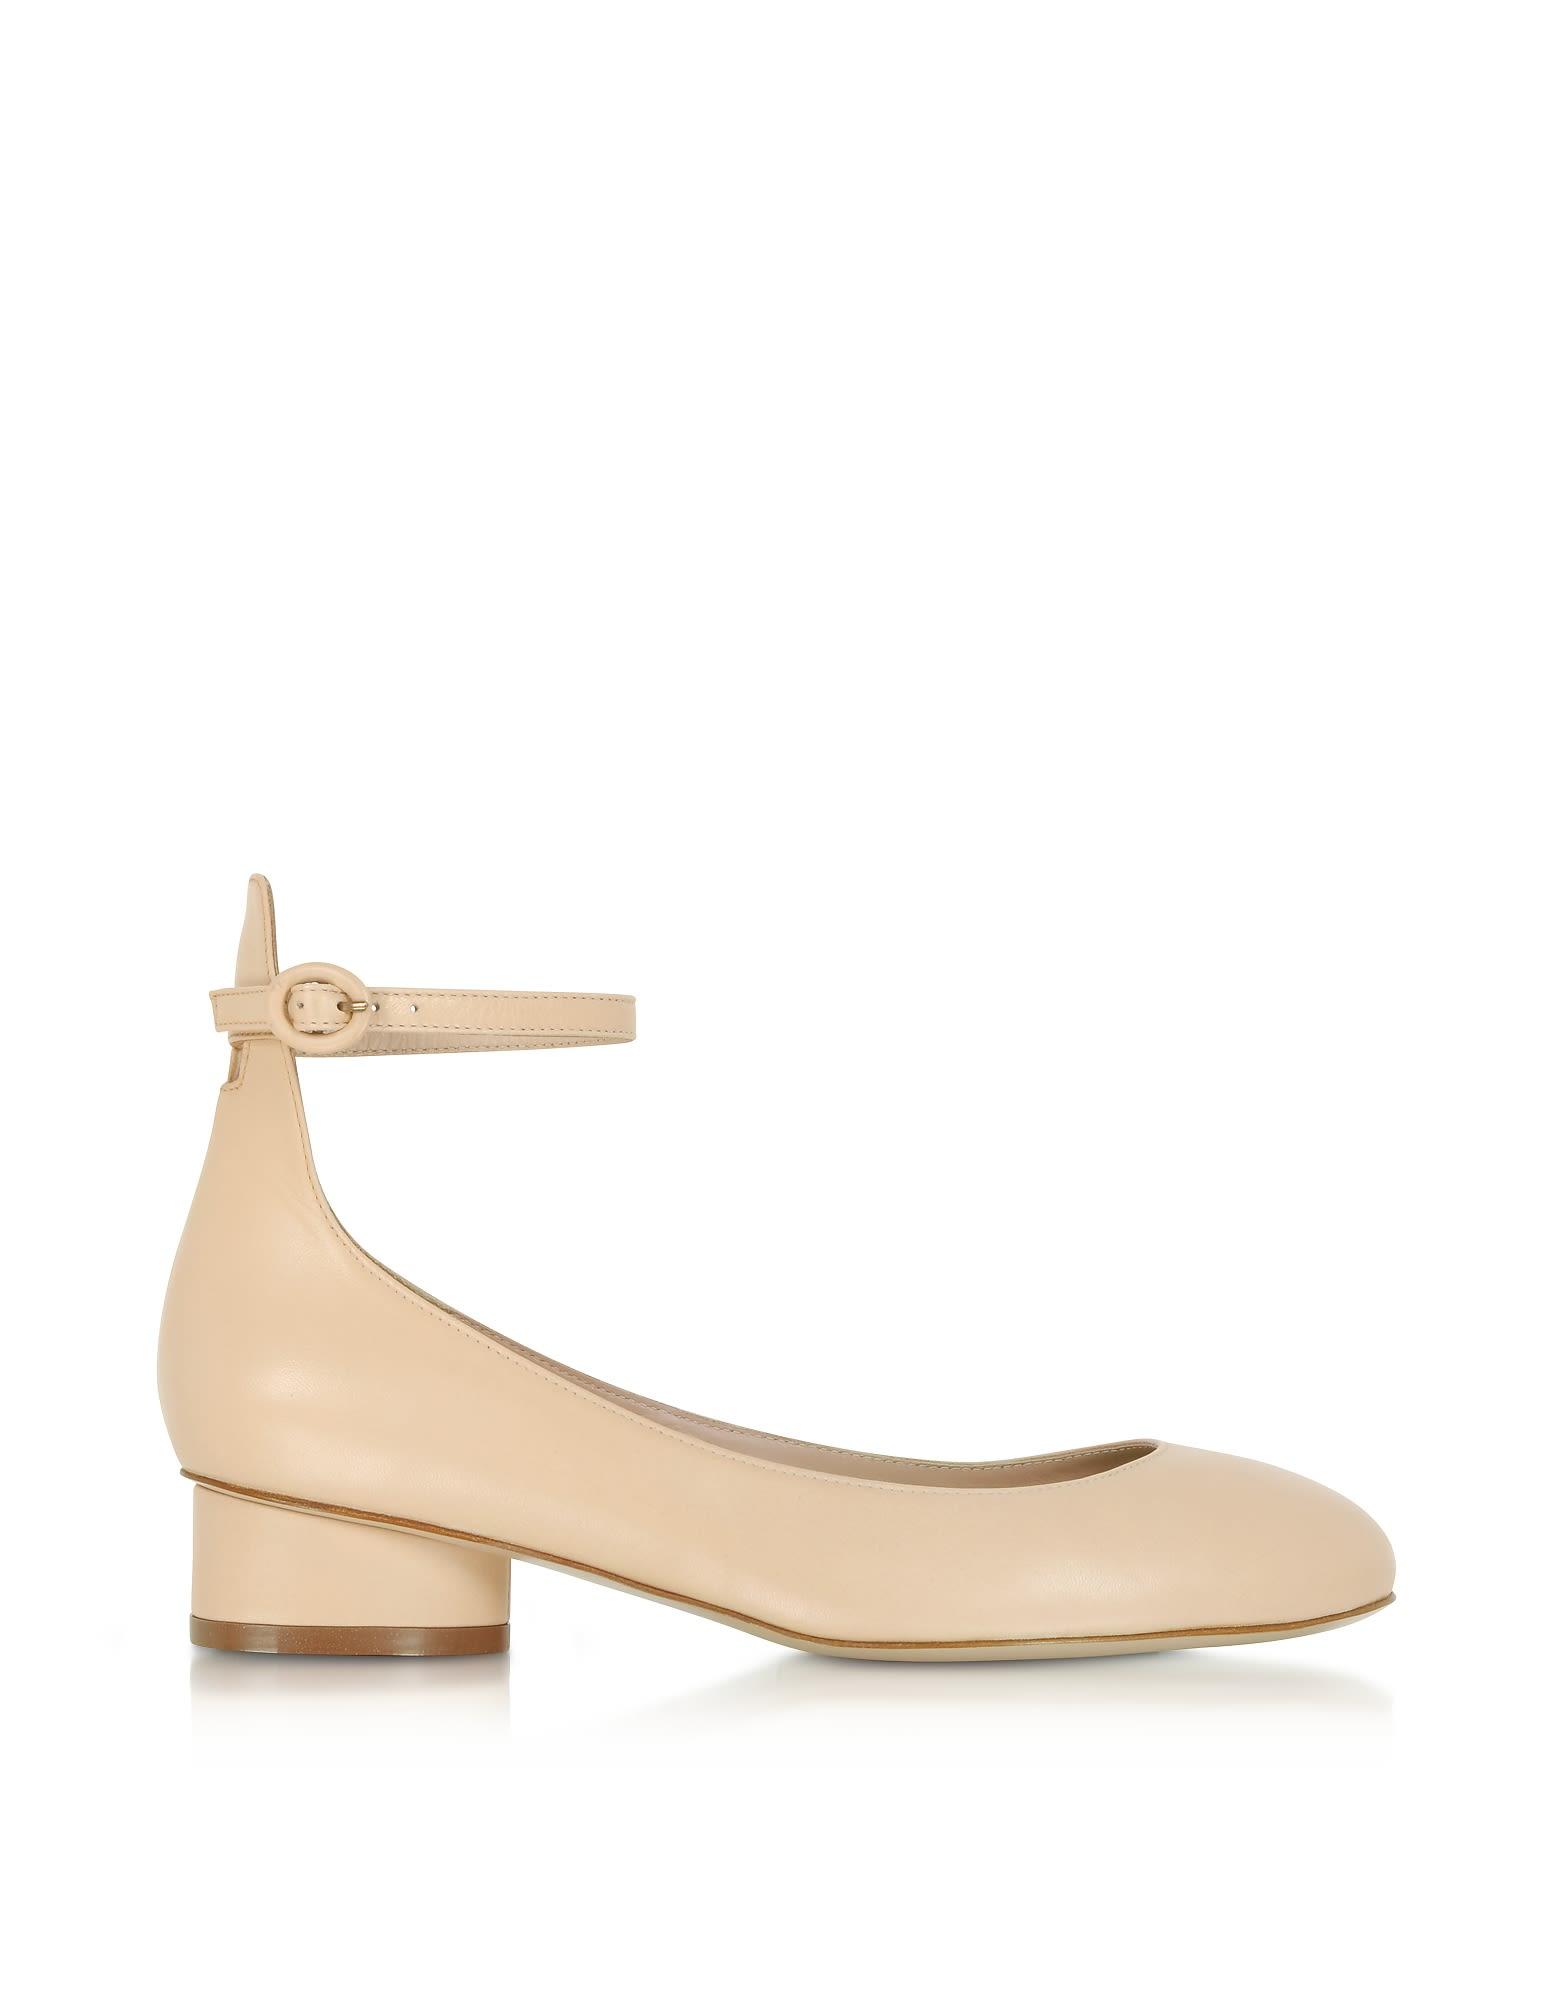 Stuart Weitzman Polly Blush Leather Mid-heel Pumps 10591184